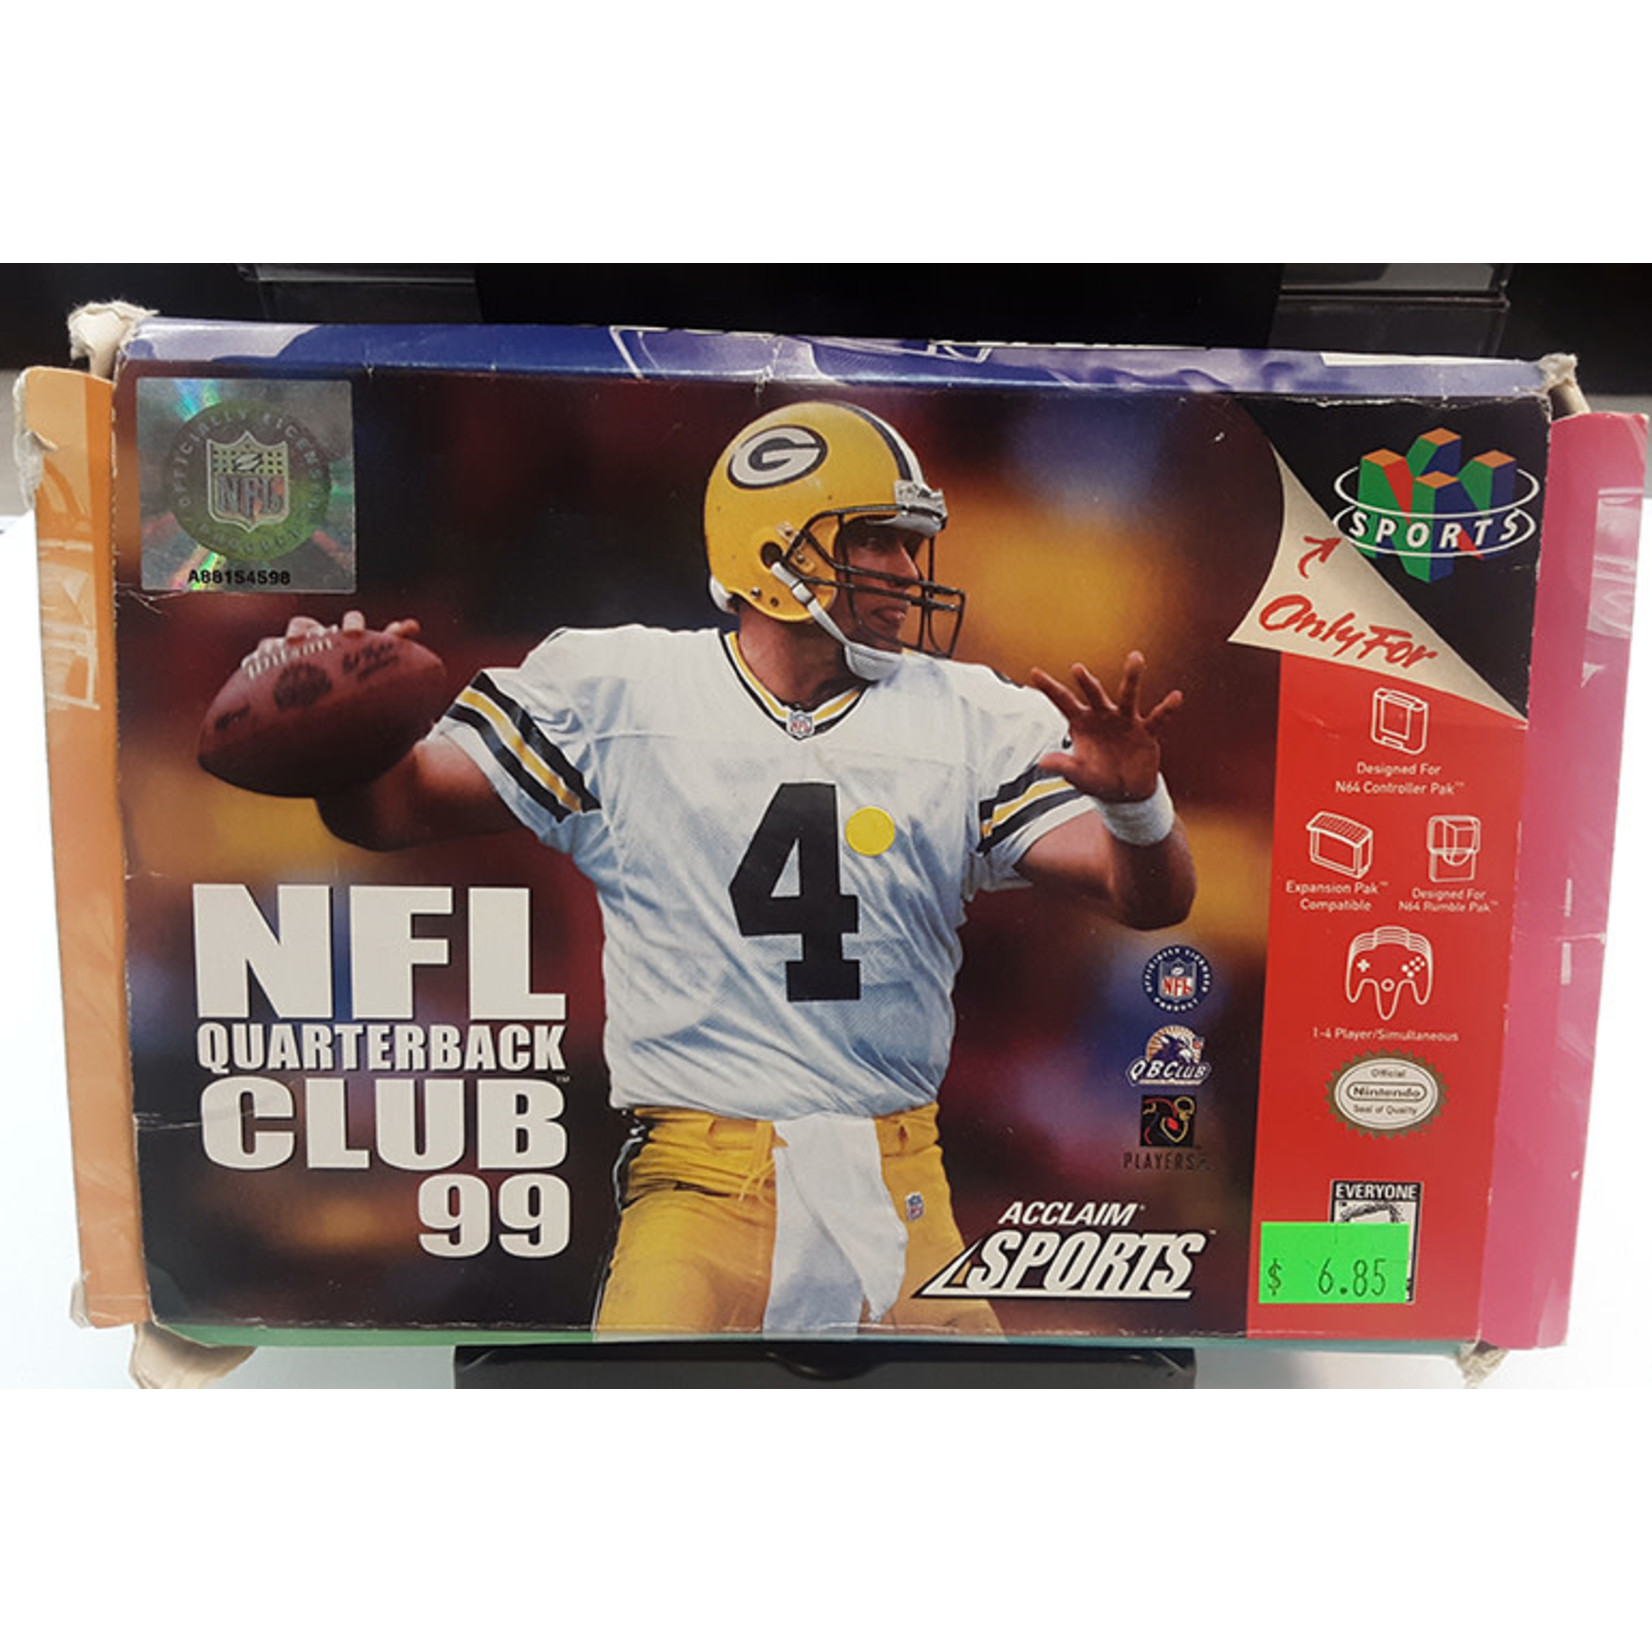 N64U-NFL QUARTERBACK CLUB 99 BOXED